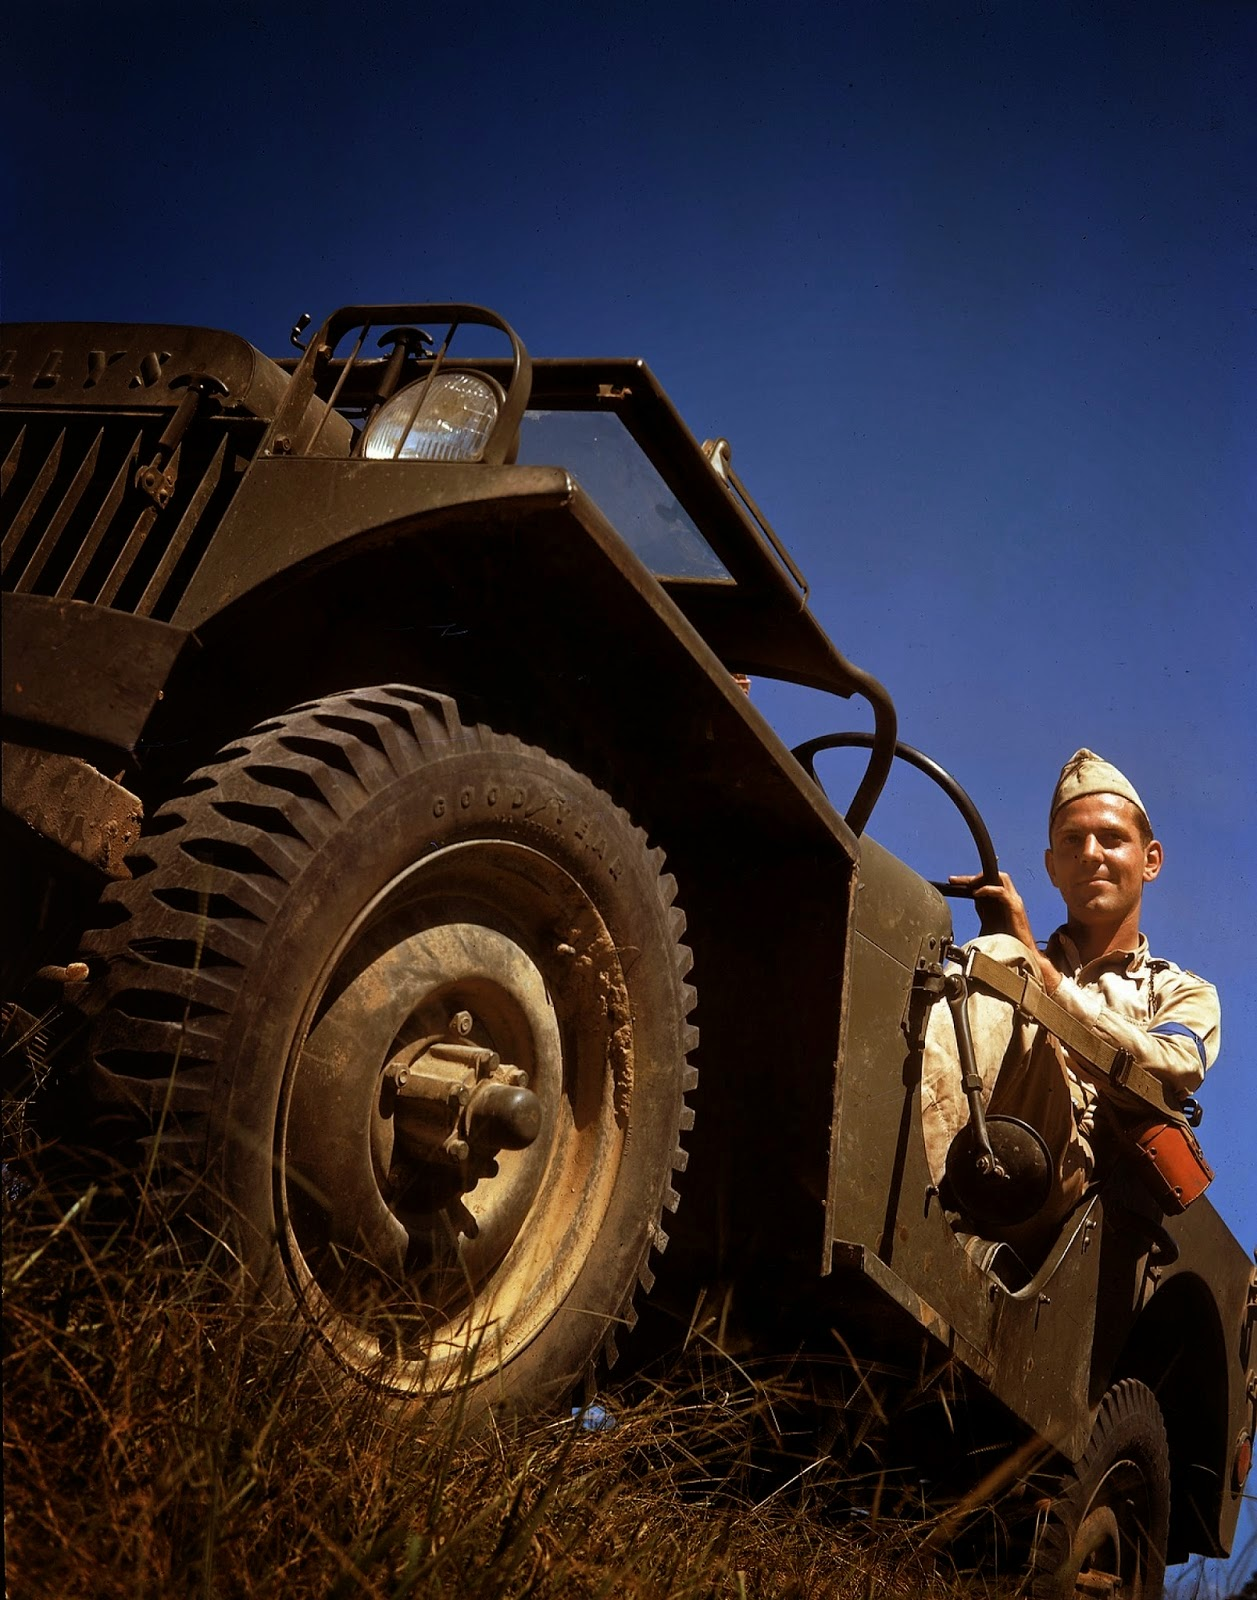 http://4.bp.blogspot.com/-RByhffQHok8/VLabeX8NyII/AAAAAAABOLY/pSjnuDneBlU/s1600/Rare+Color+Photographs+from+World+War+II+(23).jpg